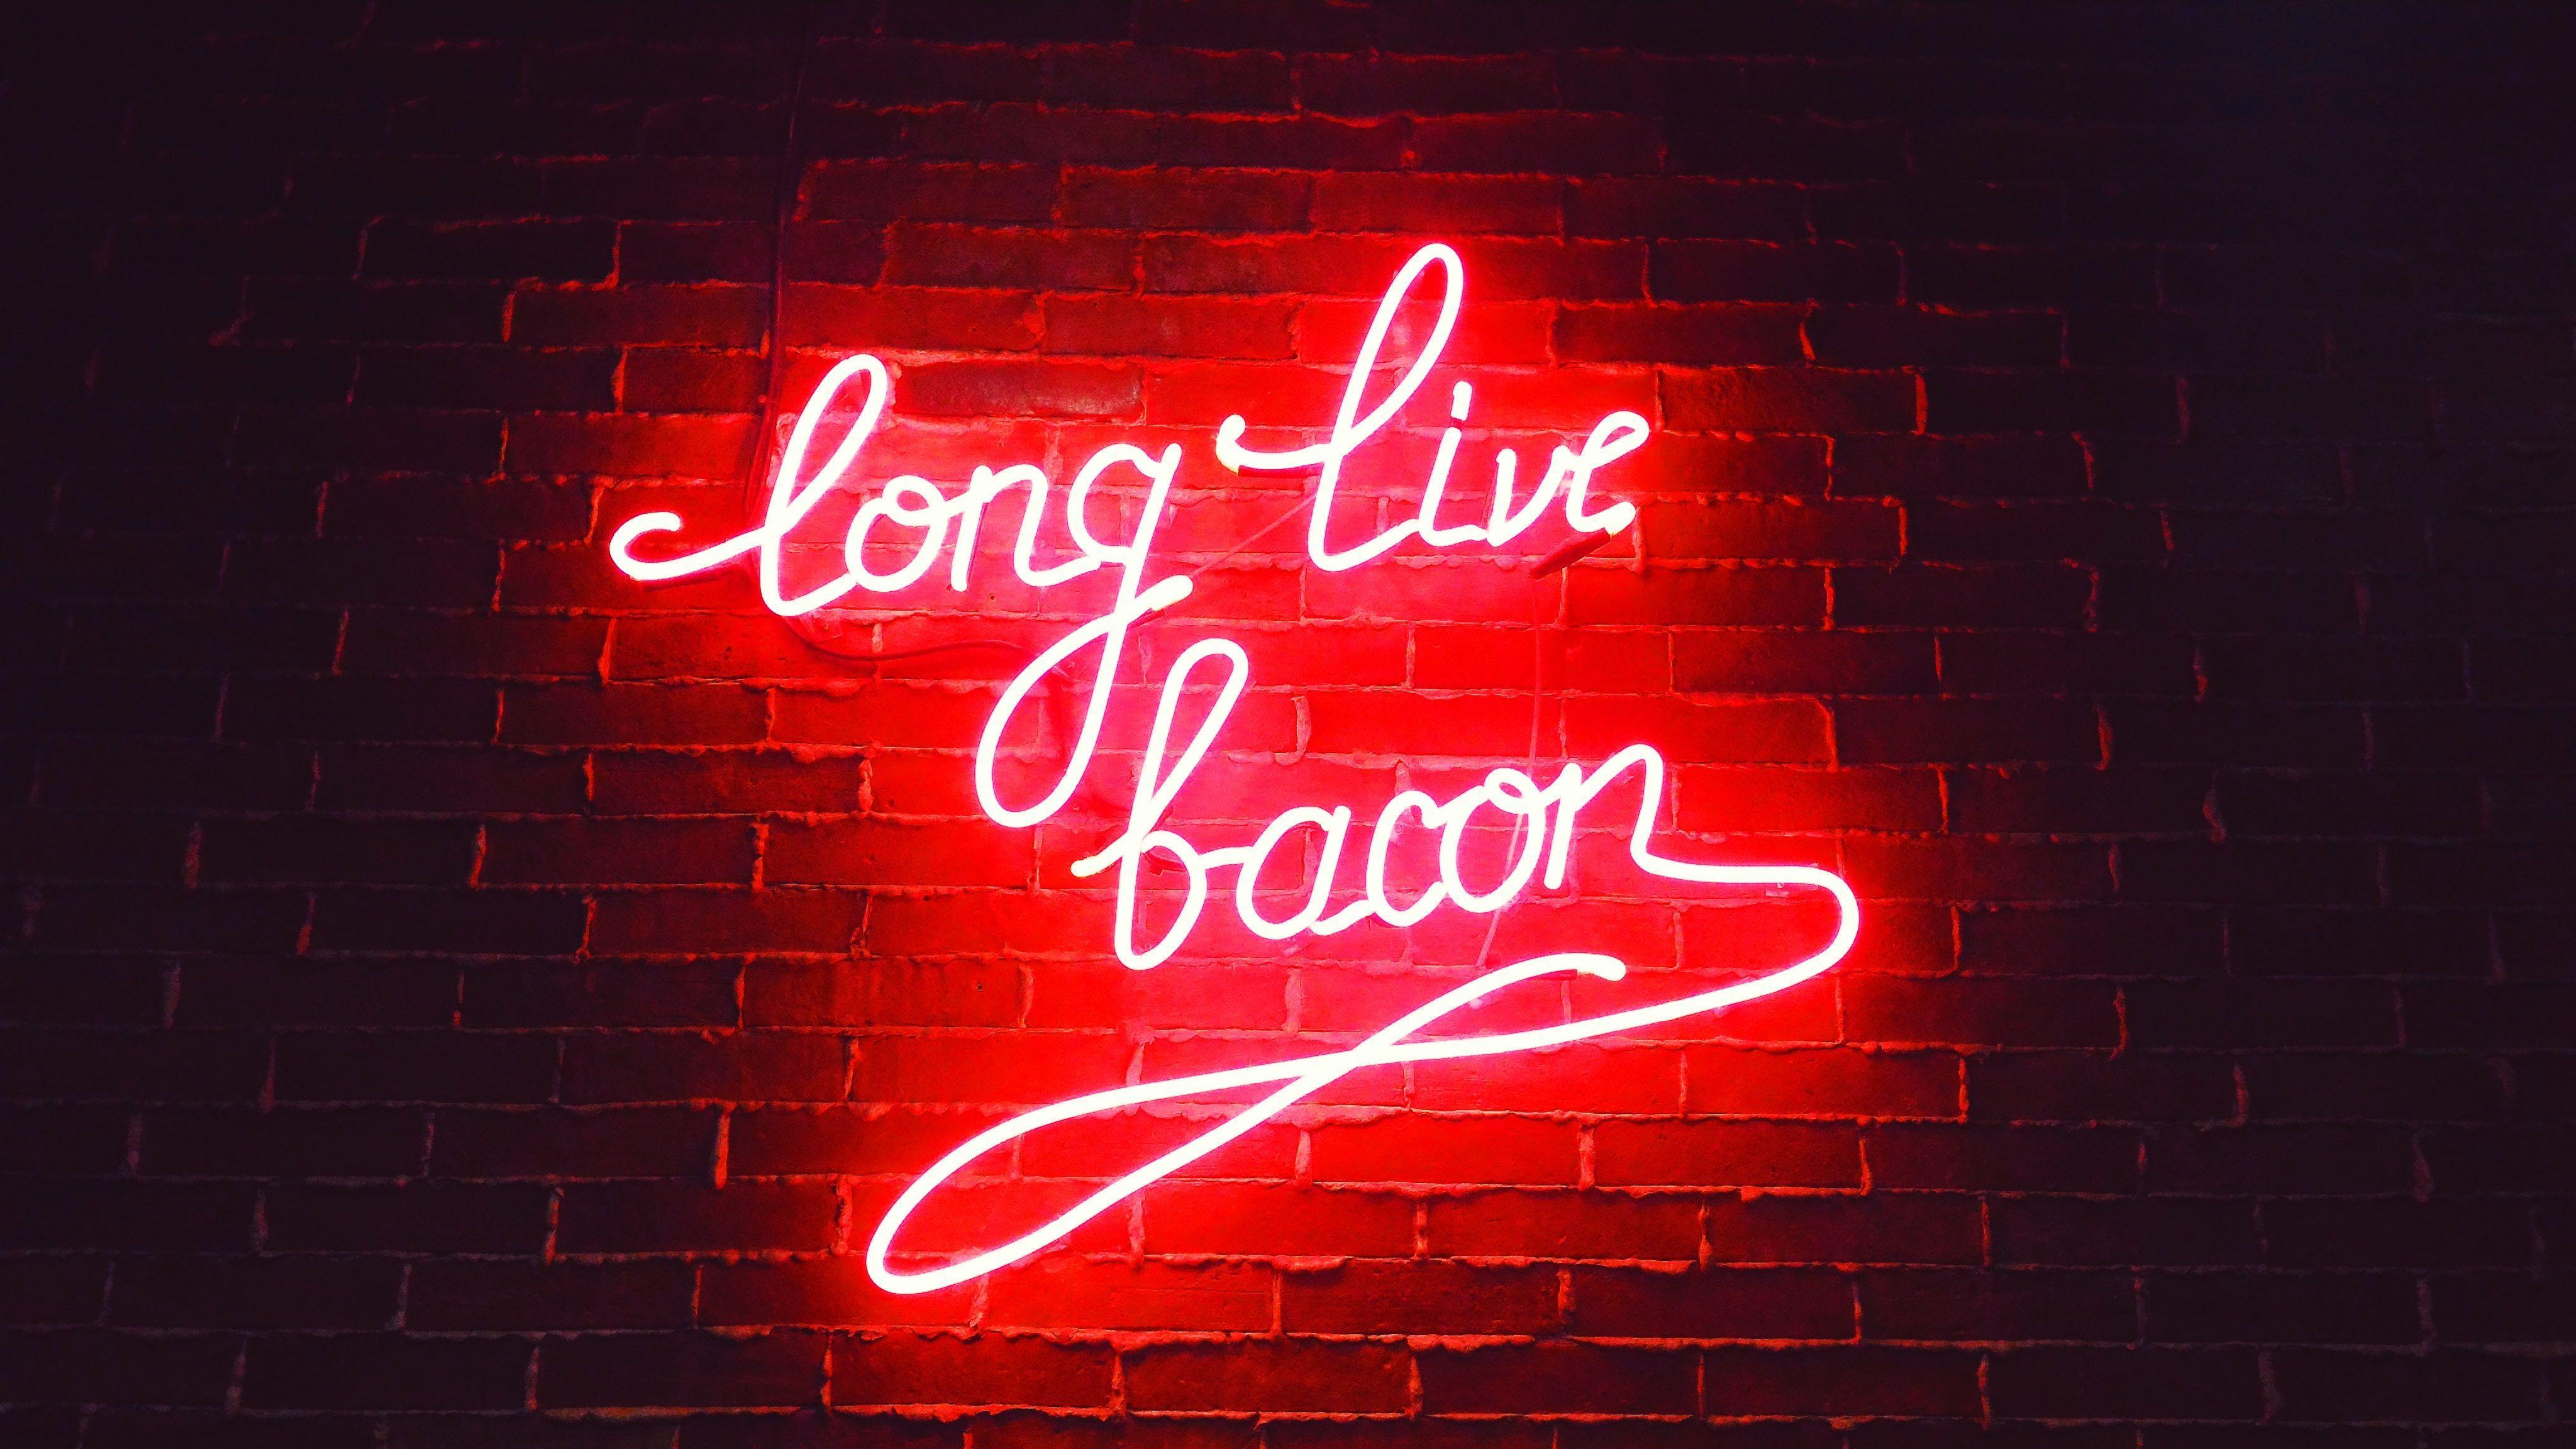 4k Neon Light Sign Wallpapers Wallpaper Cave